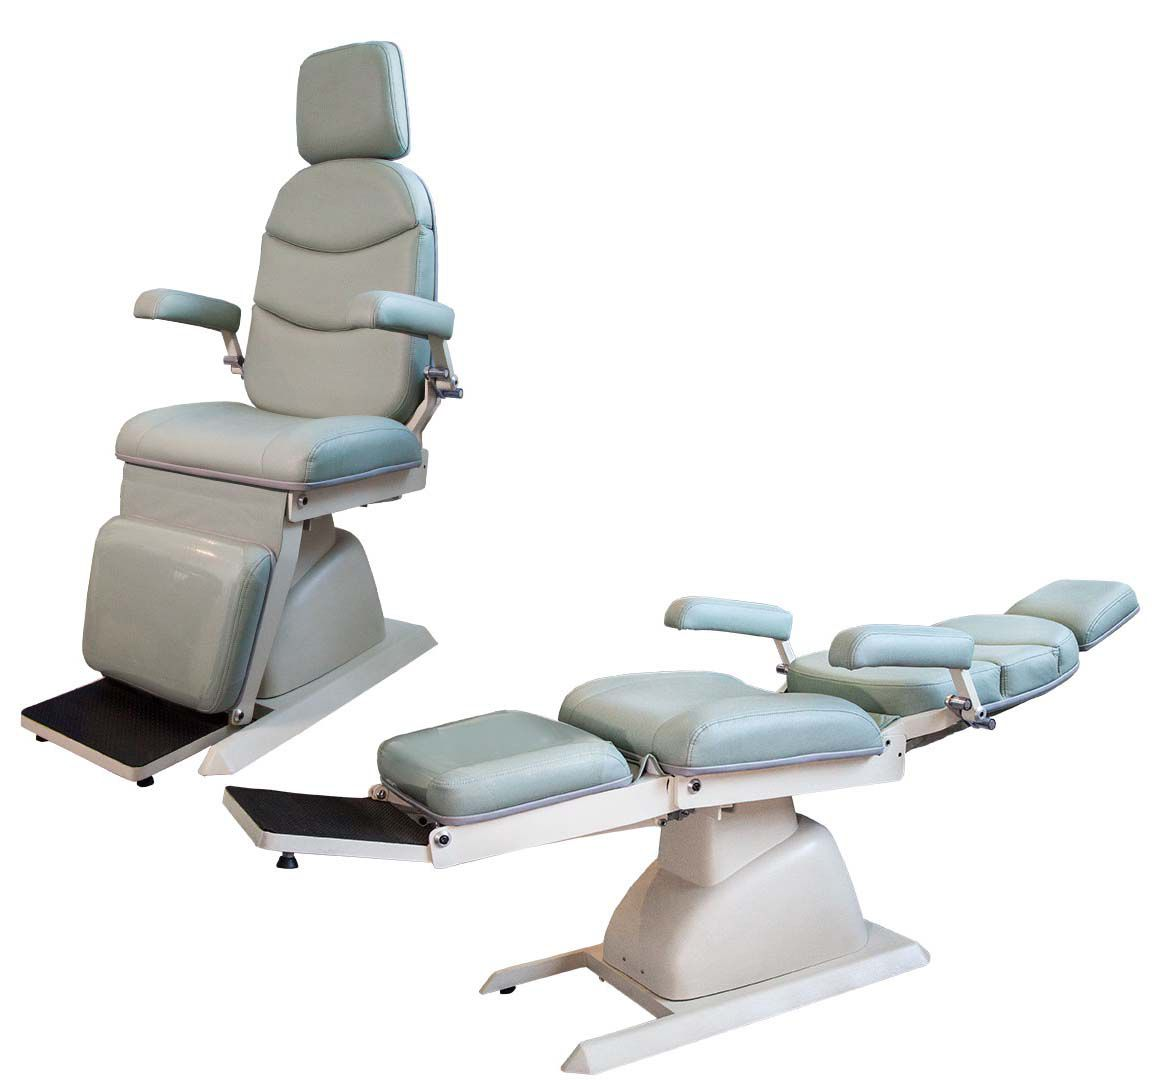 Cadeira de otorrino/ oftalmo elétrica